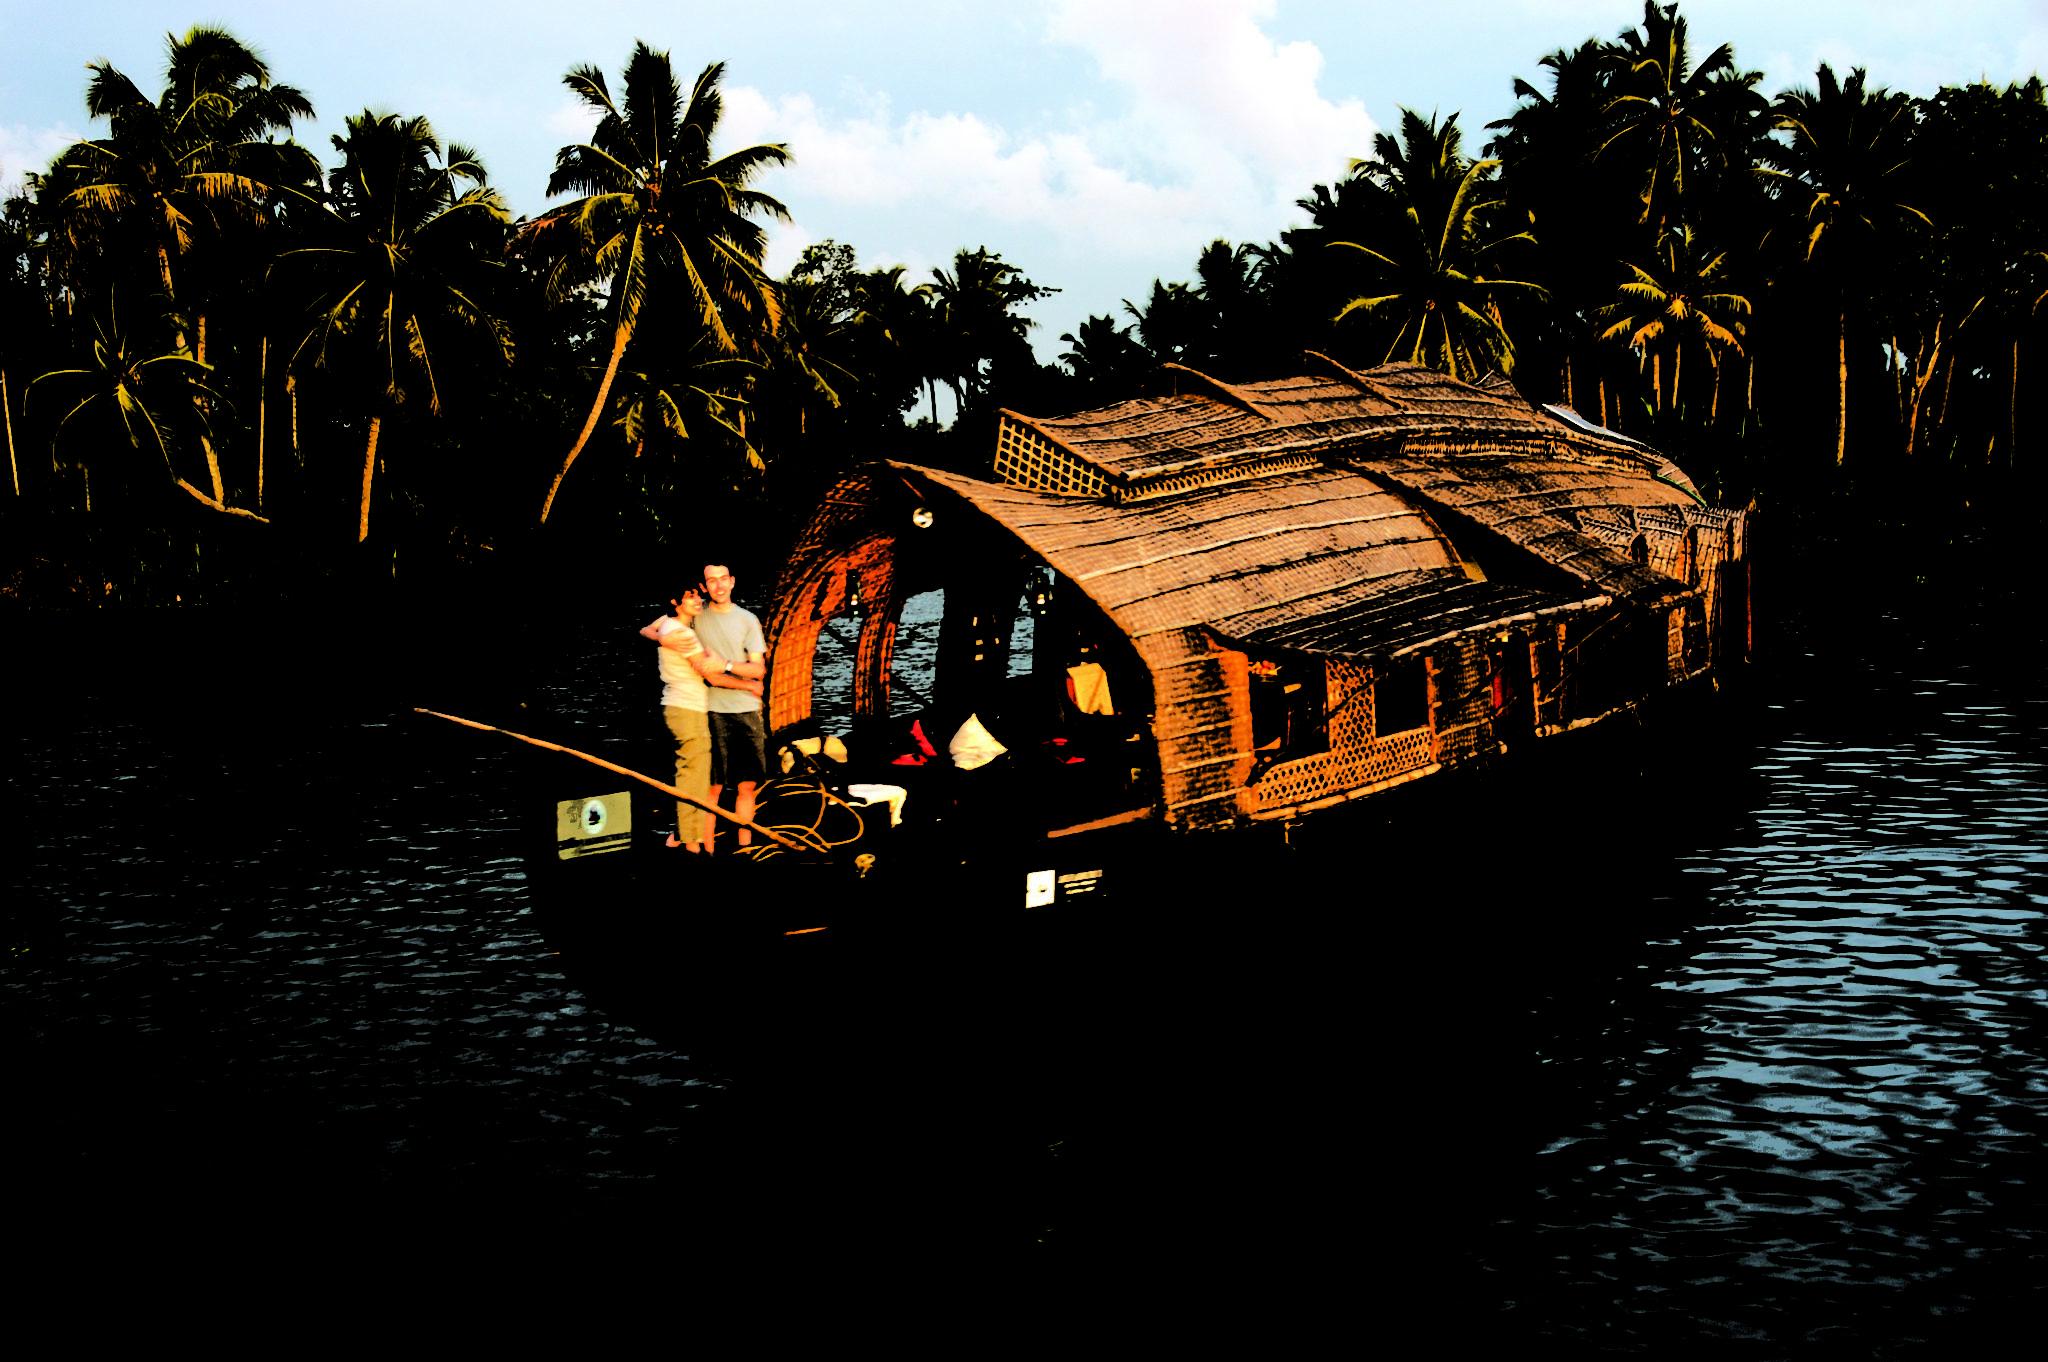 Kerala Tour Package - 2020-2021 - Couple Enjoying Backwater Houseboat